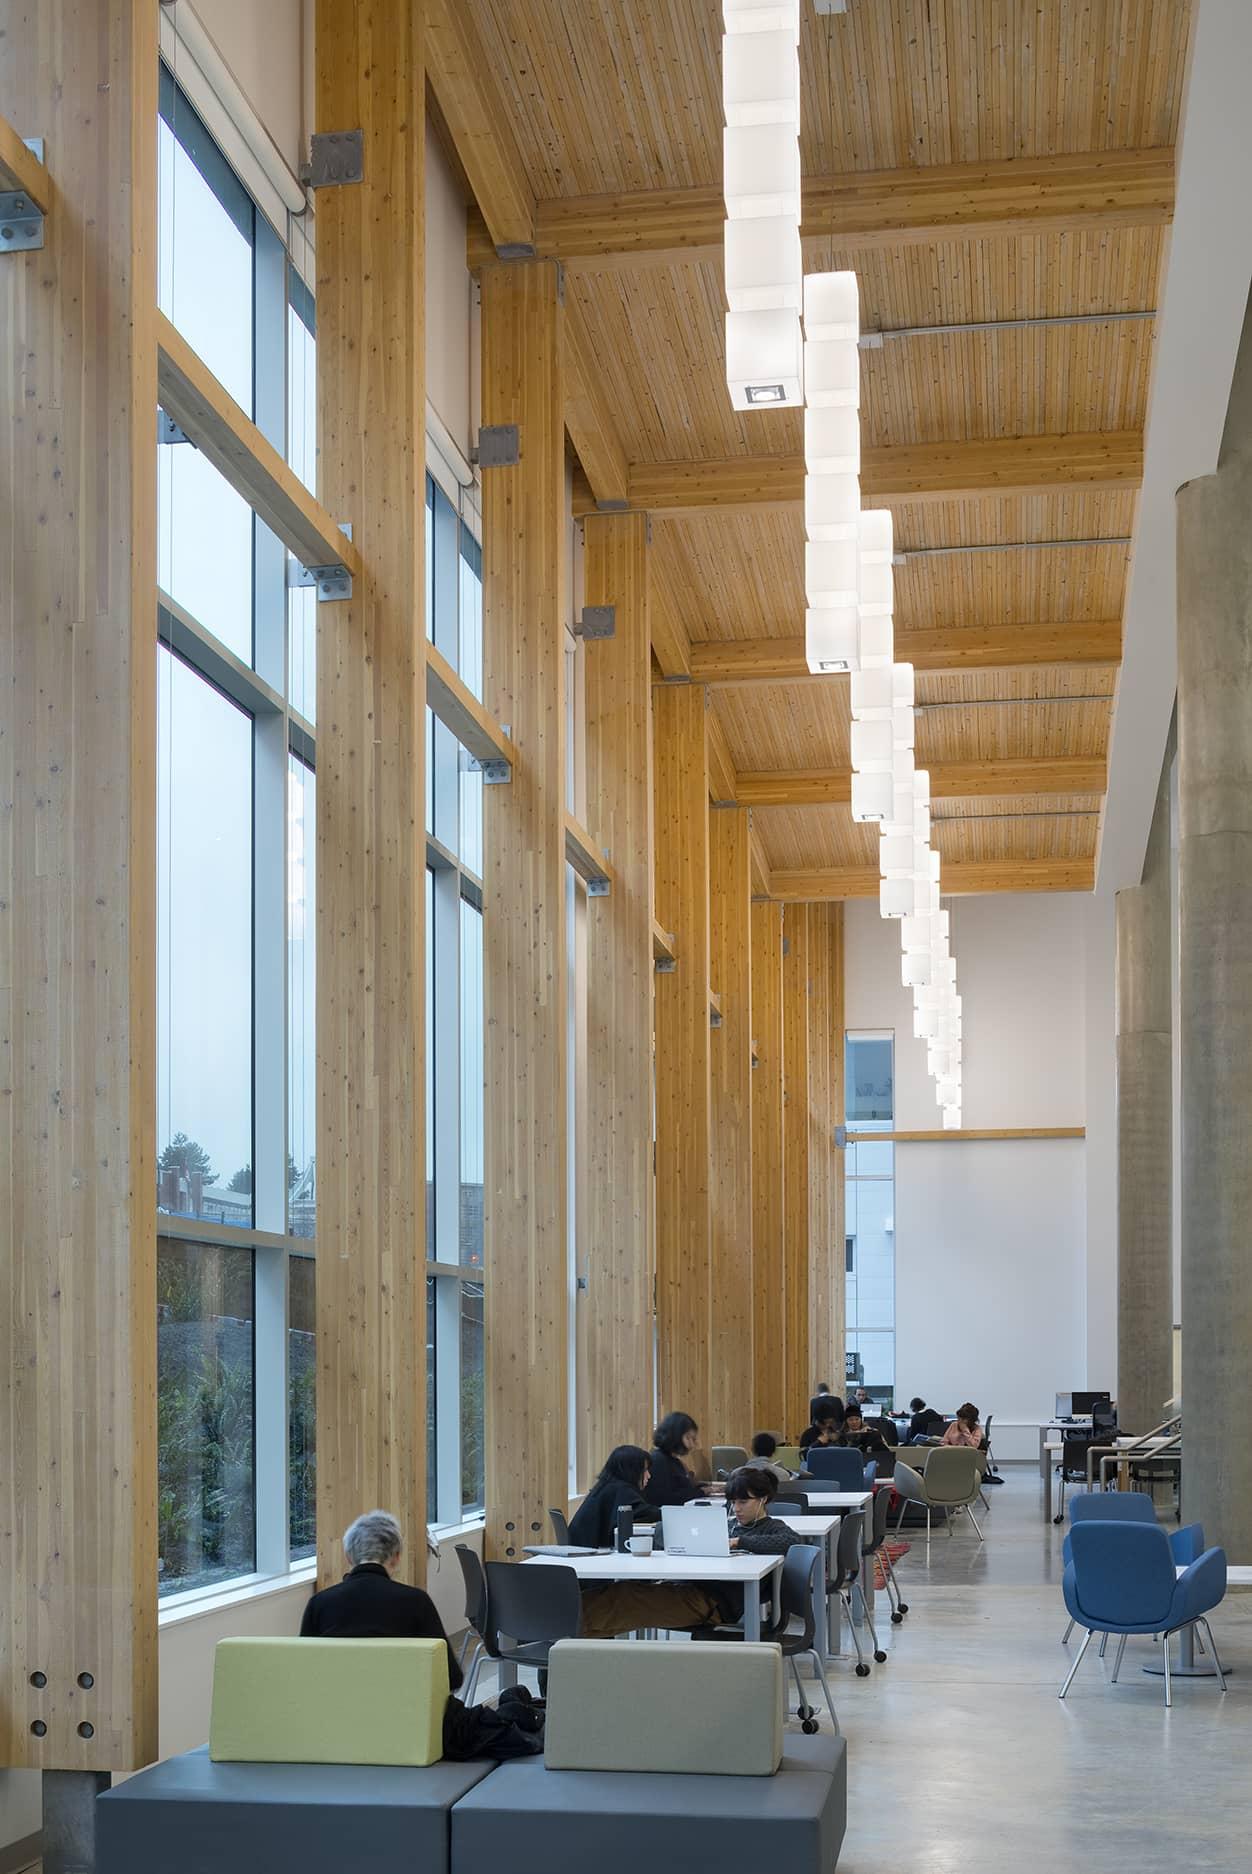 bbp emily carr university of art + design common area 1